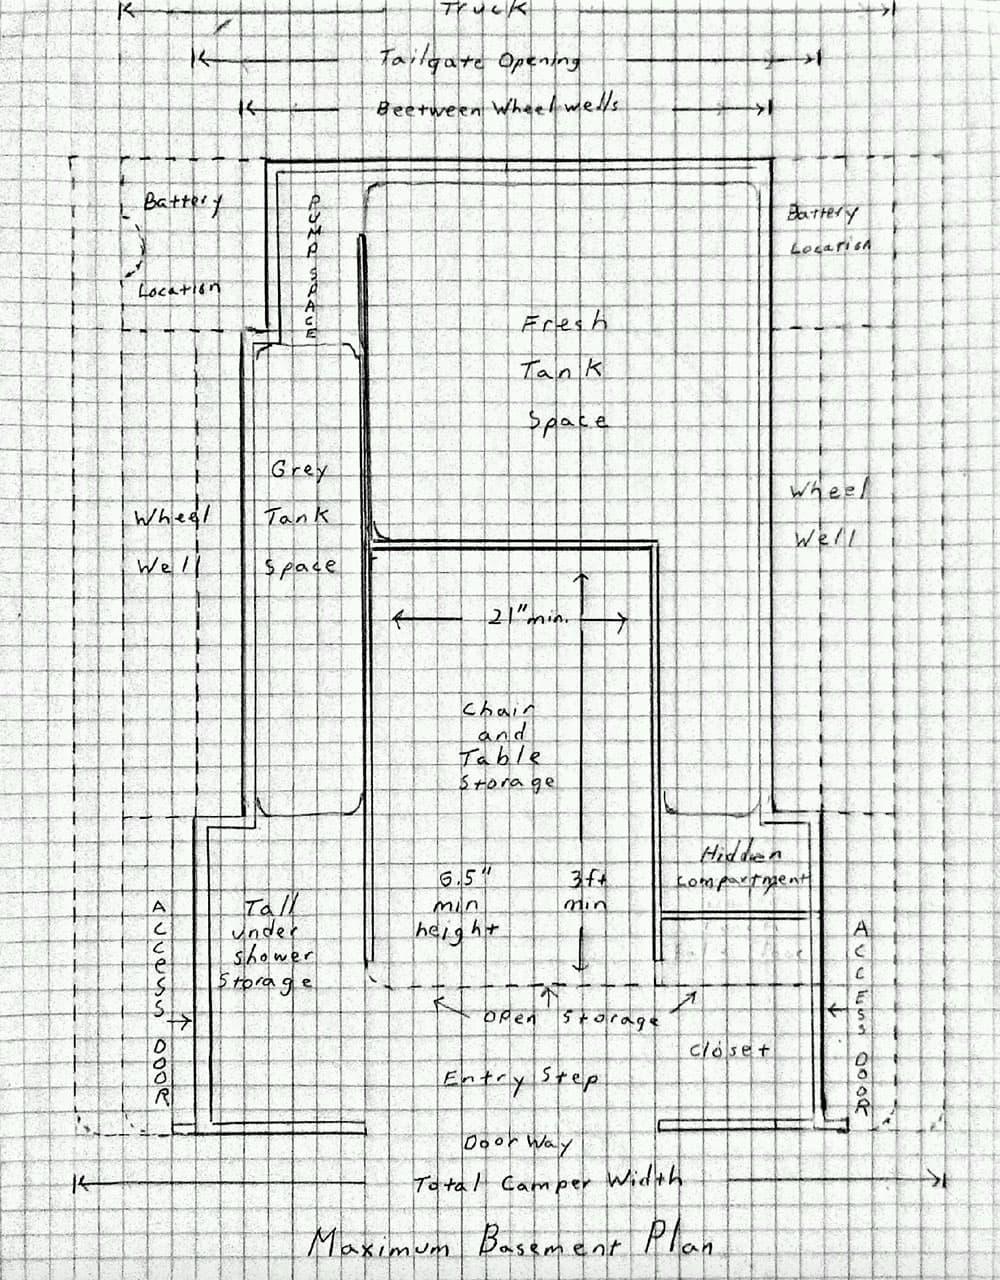 dream camper floor plan contest part 1 floor plan rives 2 floor plan rives non slide